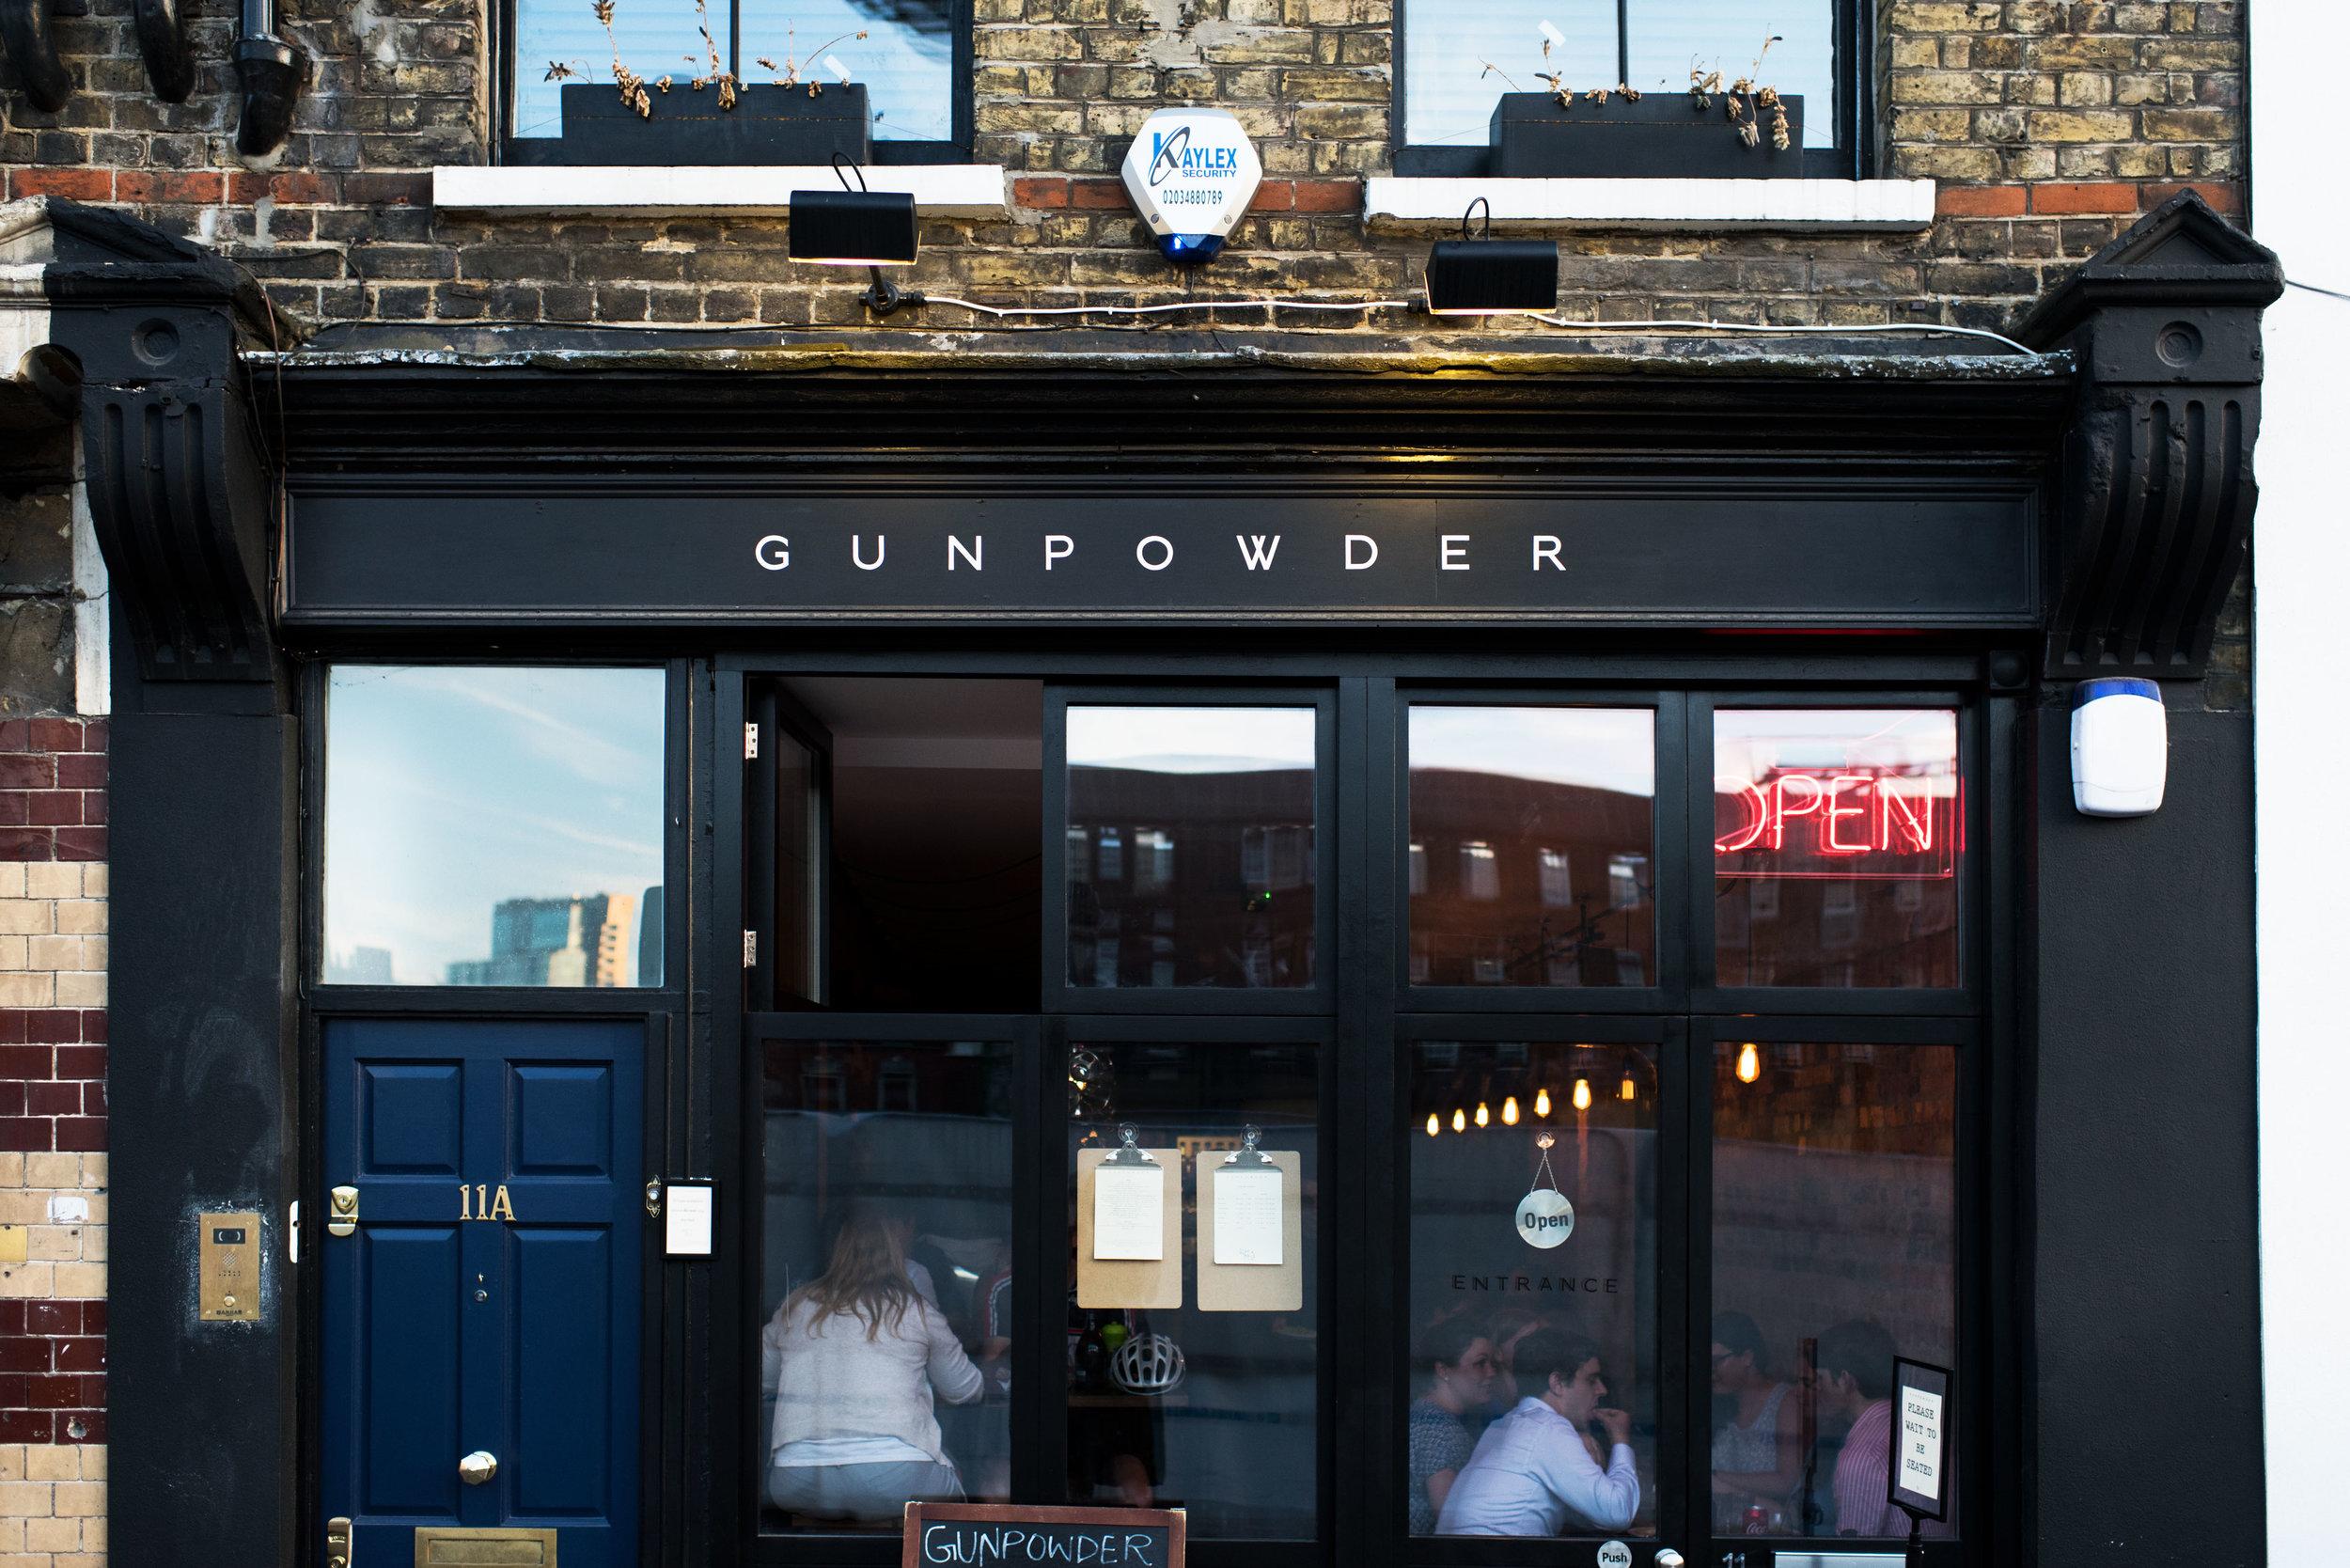 Gunpowder3.jpg